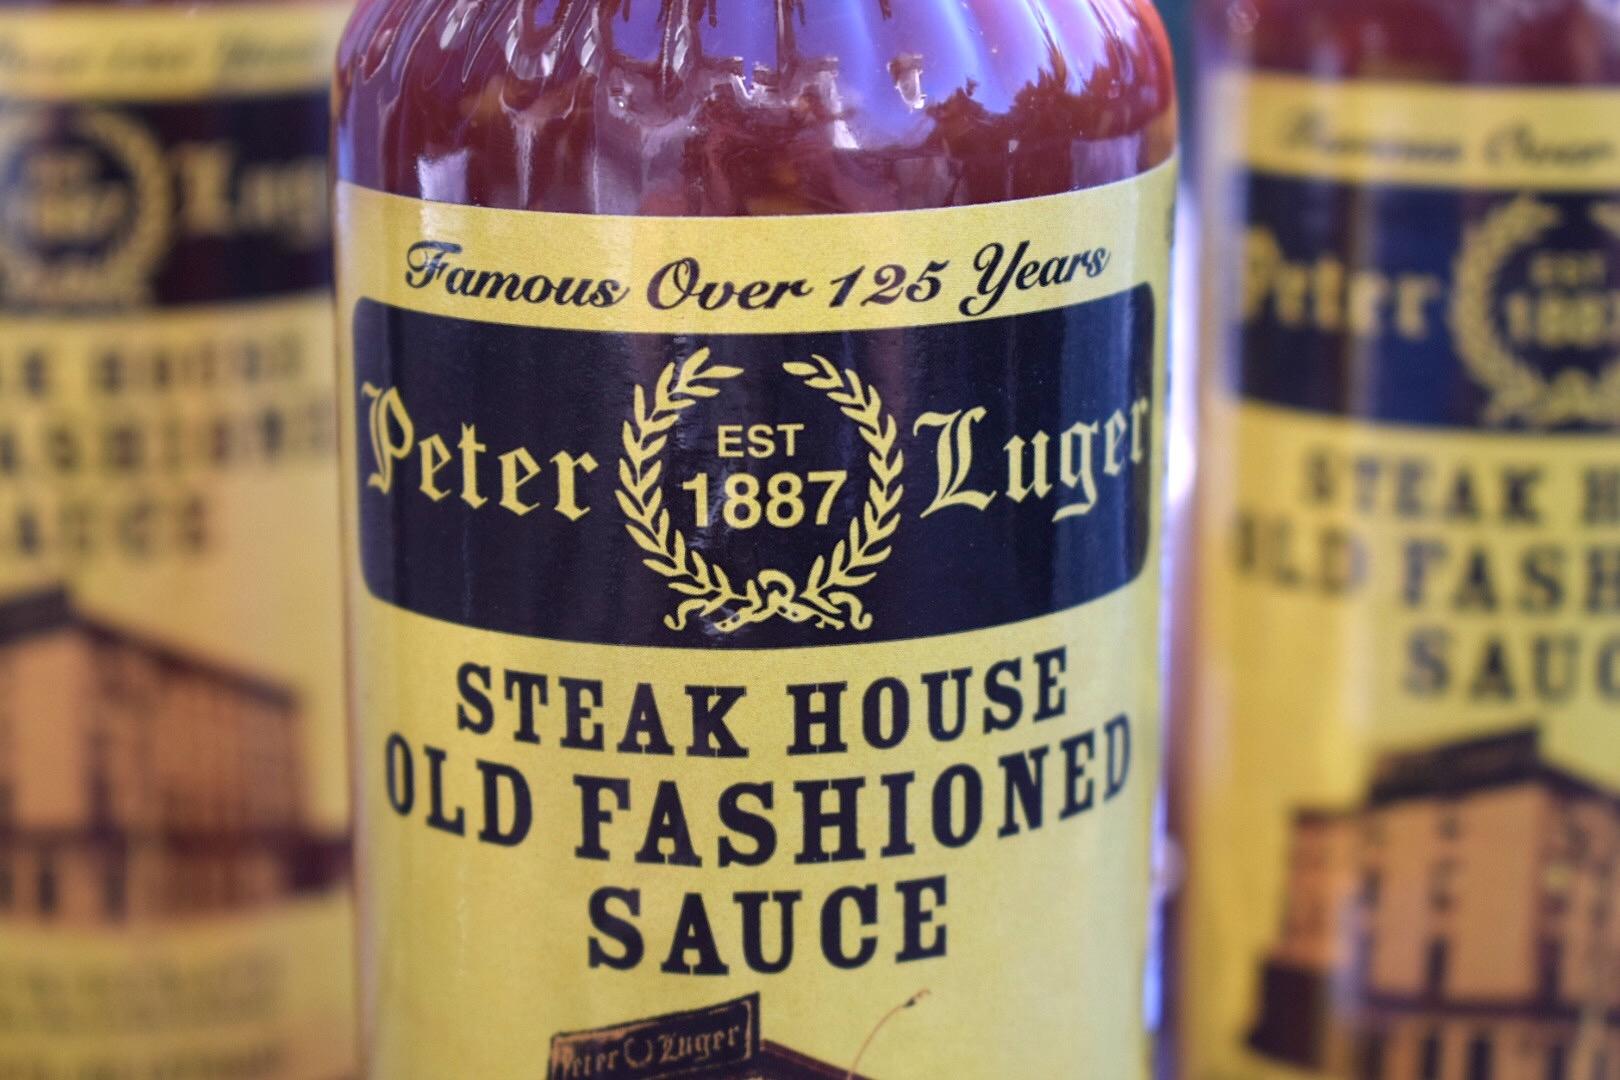 Peter Luger Steak Sauce bottle